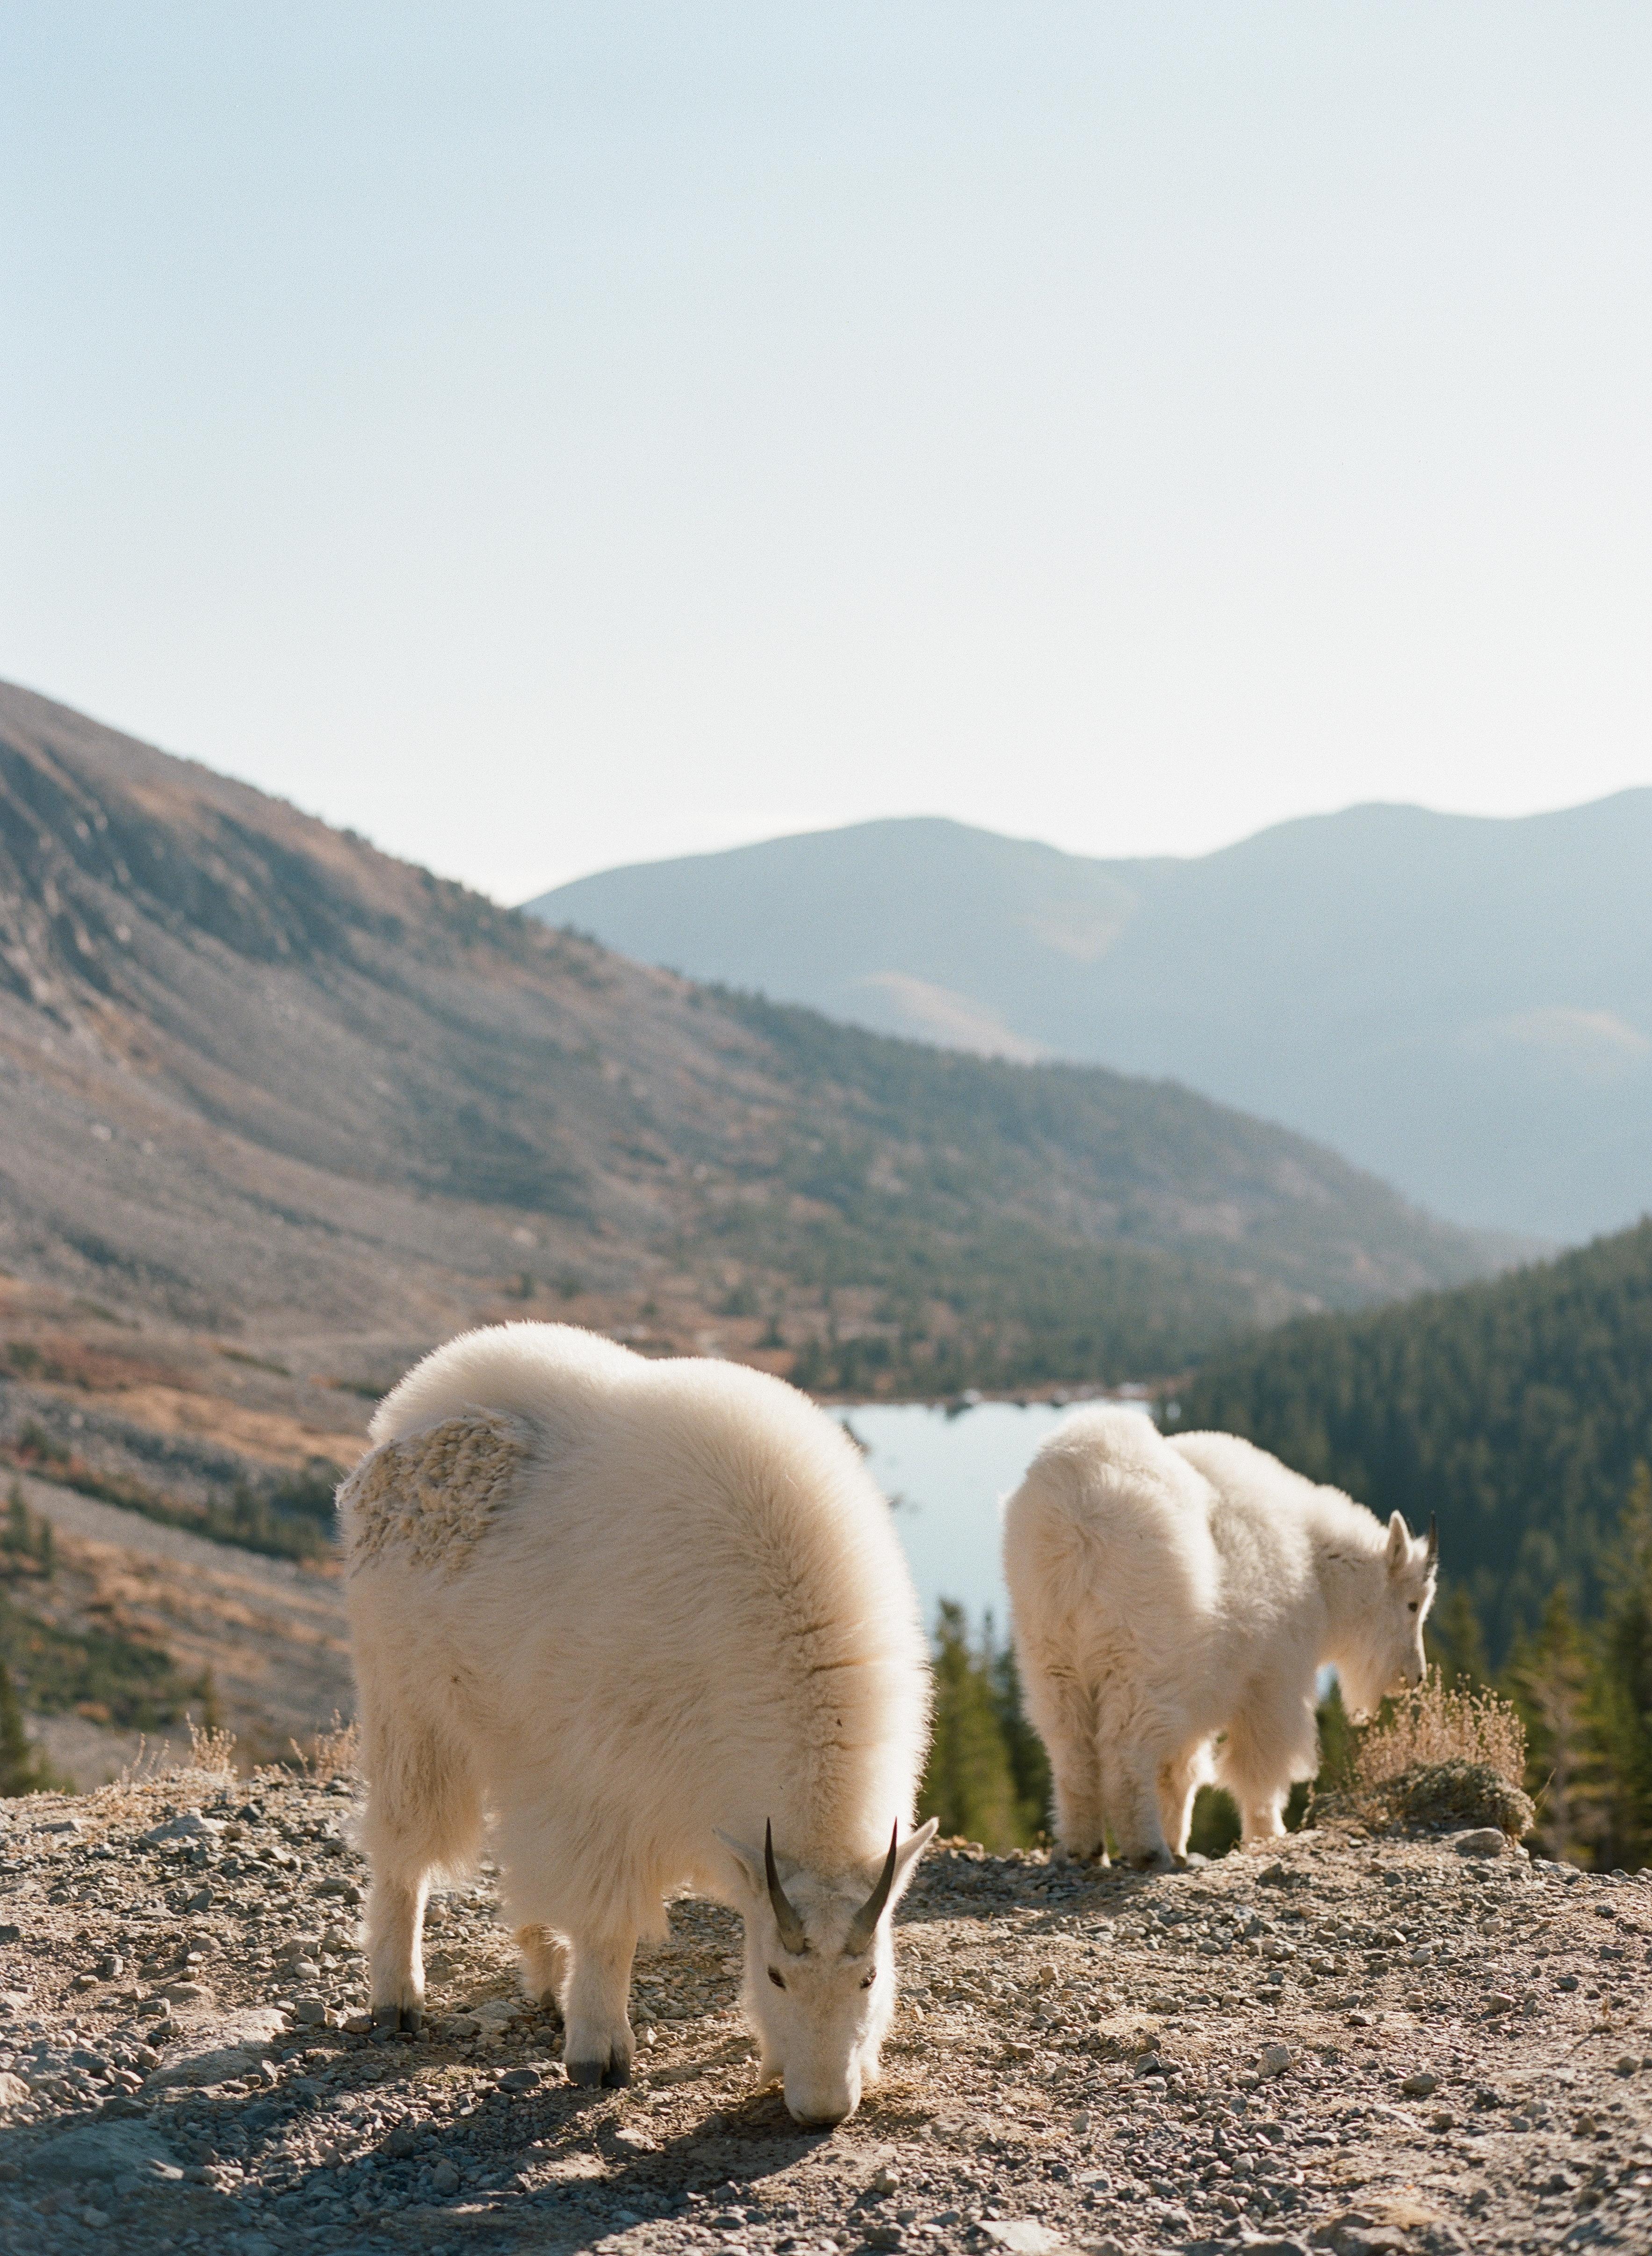 Blue-Lakes-Breckenridge-VRBO-Elopement-Wedding-Mountain-Goats-in-the-Summer